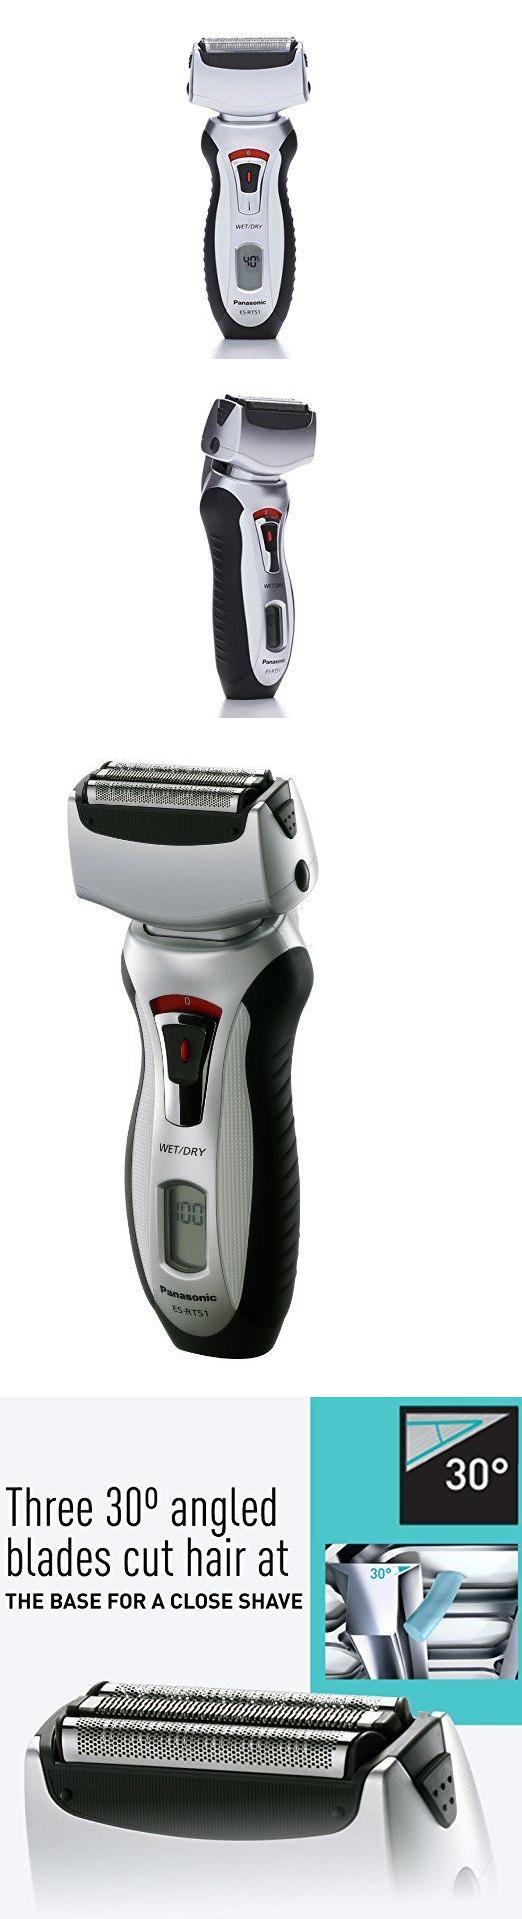 Panasonic Es Rt51 S Arc3 Wet Dry 3 Blade Cordless Electric Razor Rw30 Rechargeable Shaver With Flexible Pivoting Head